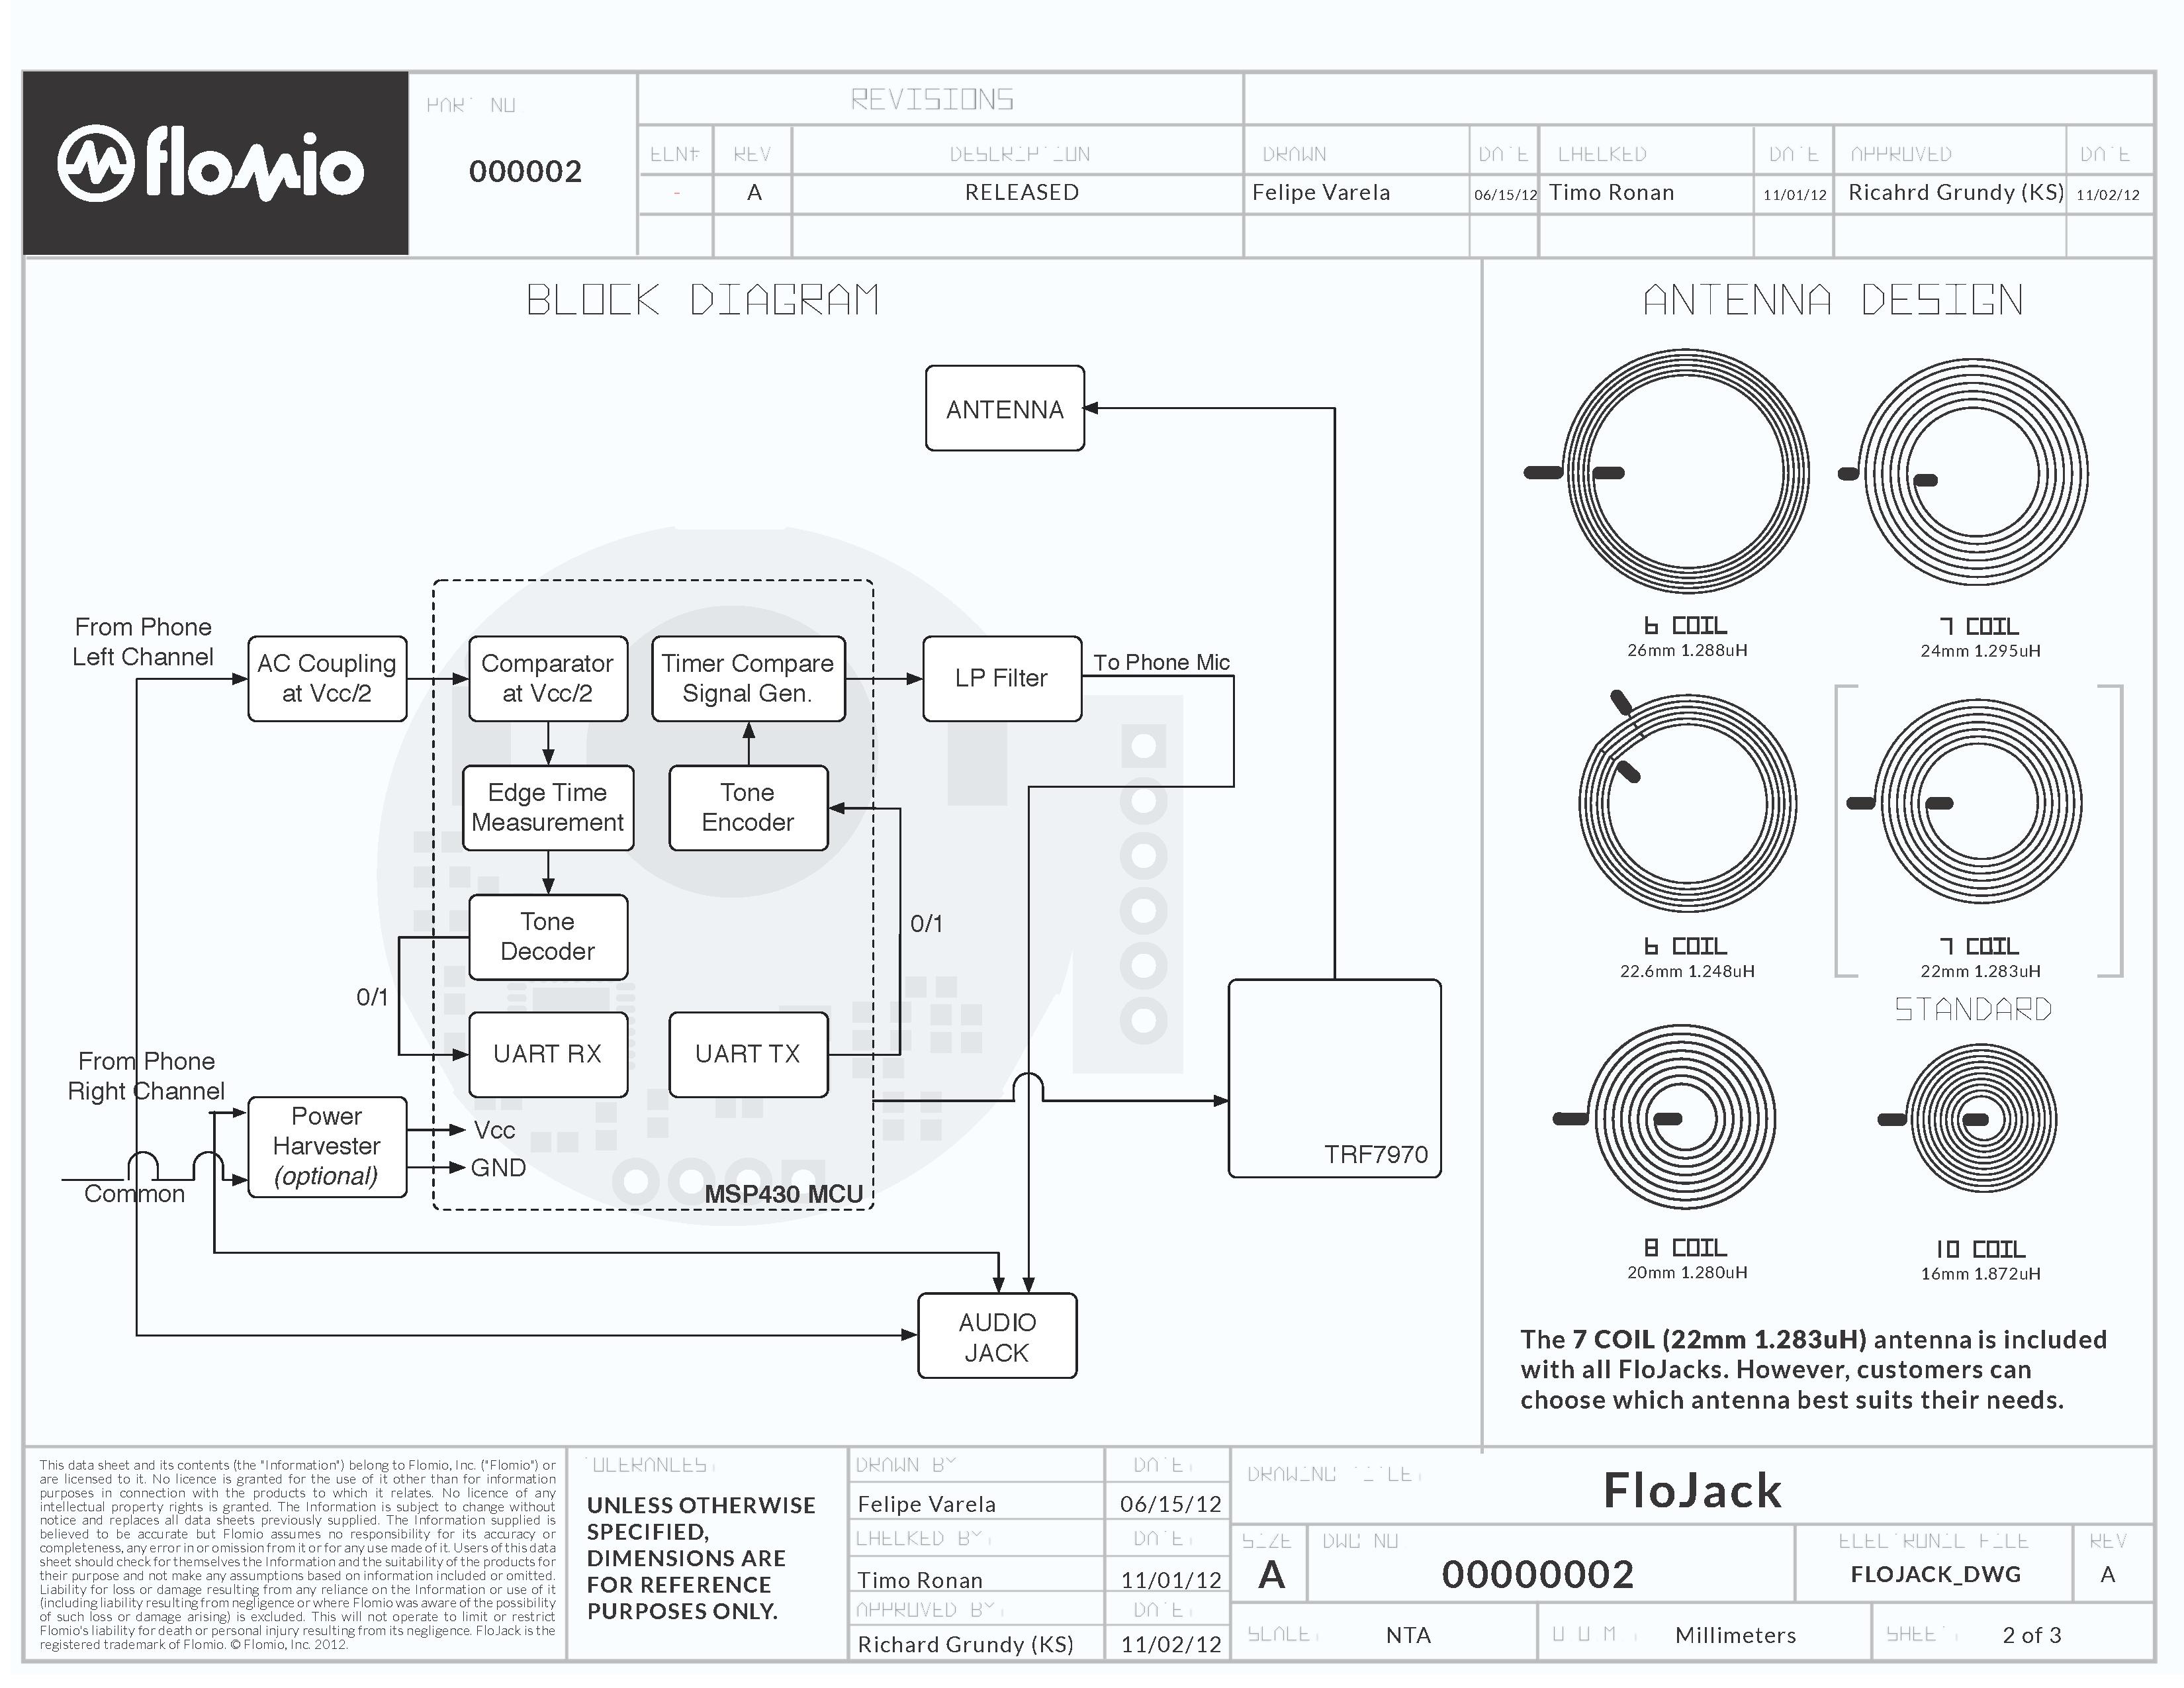 FloJack SpecSheet Design